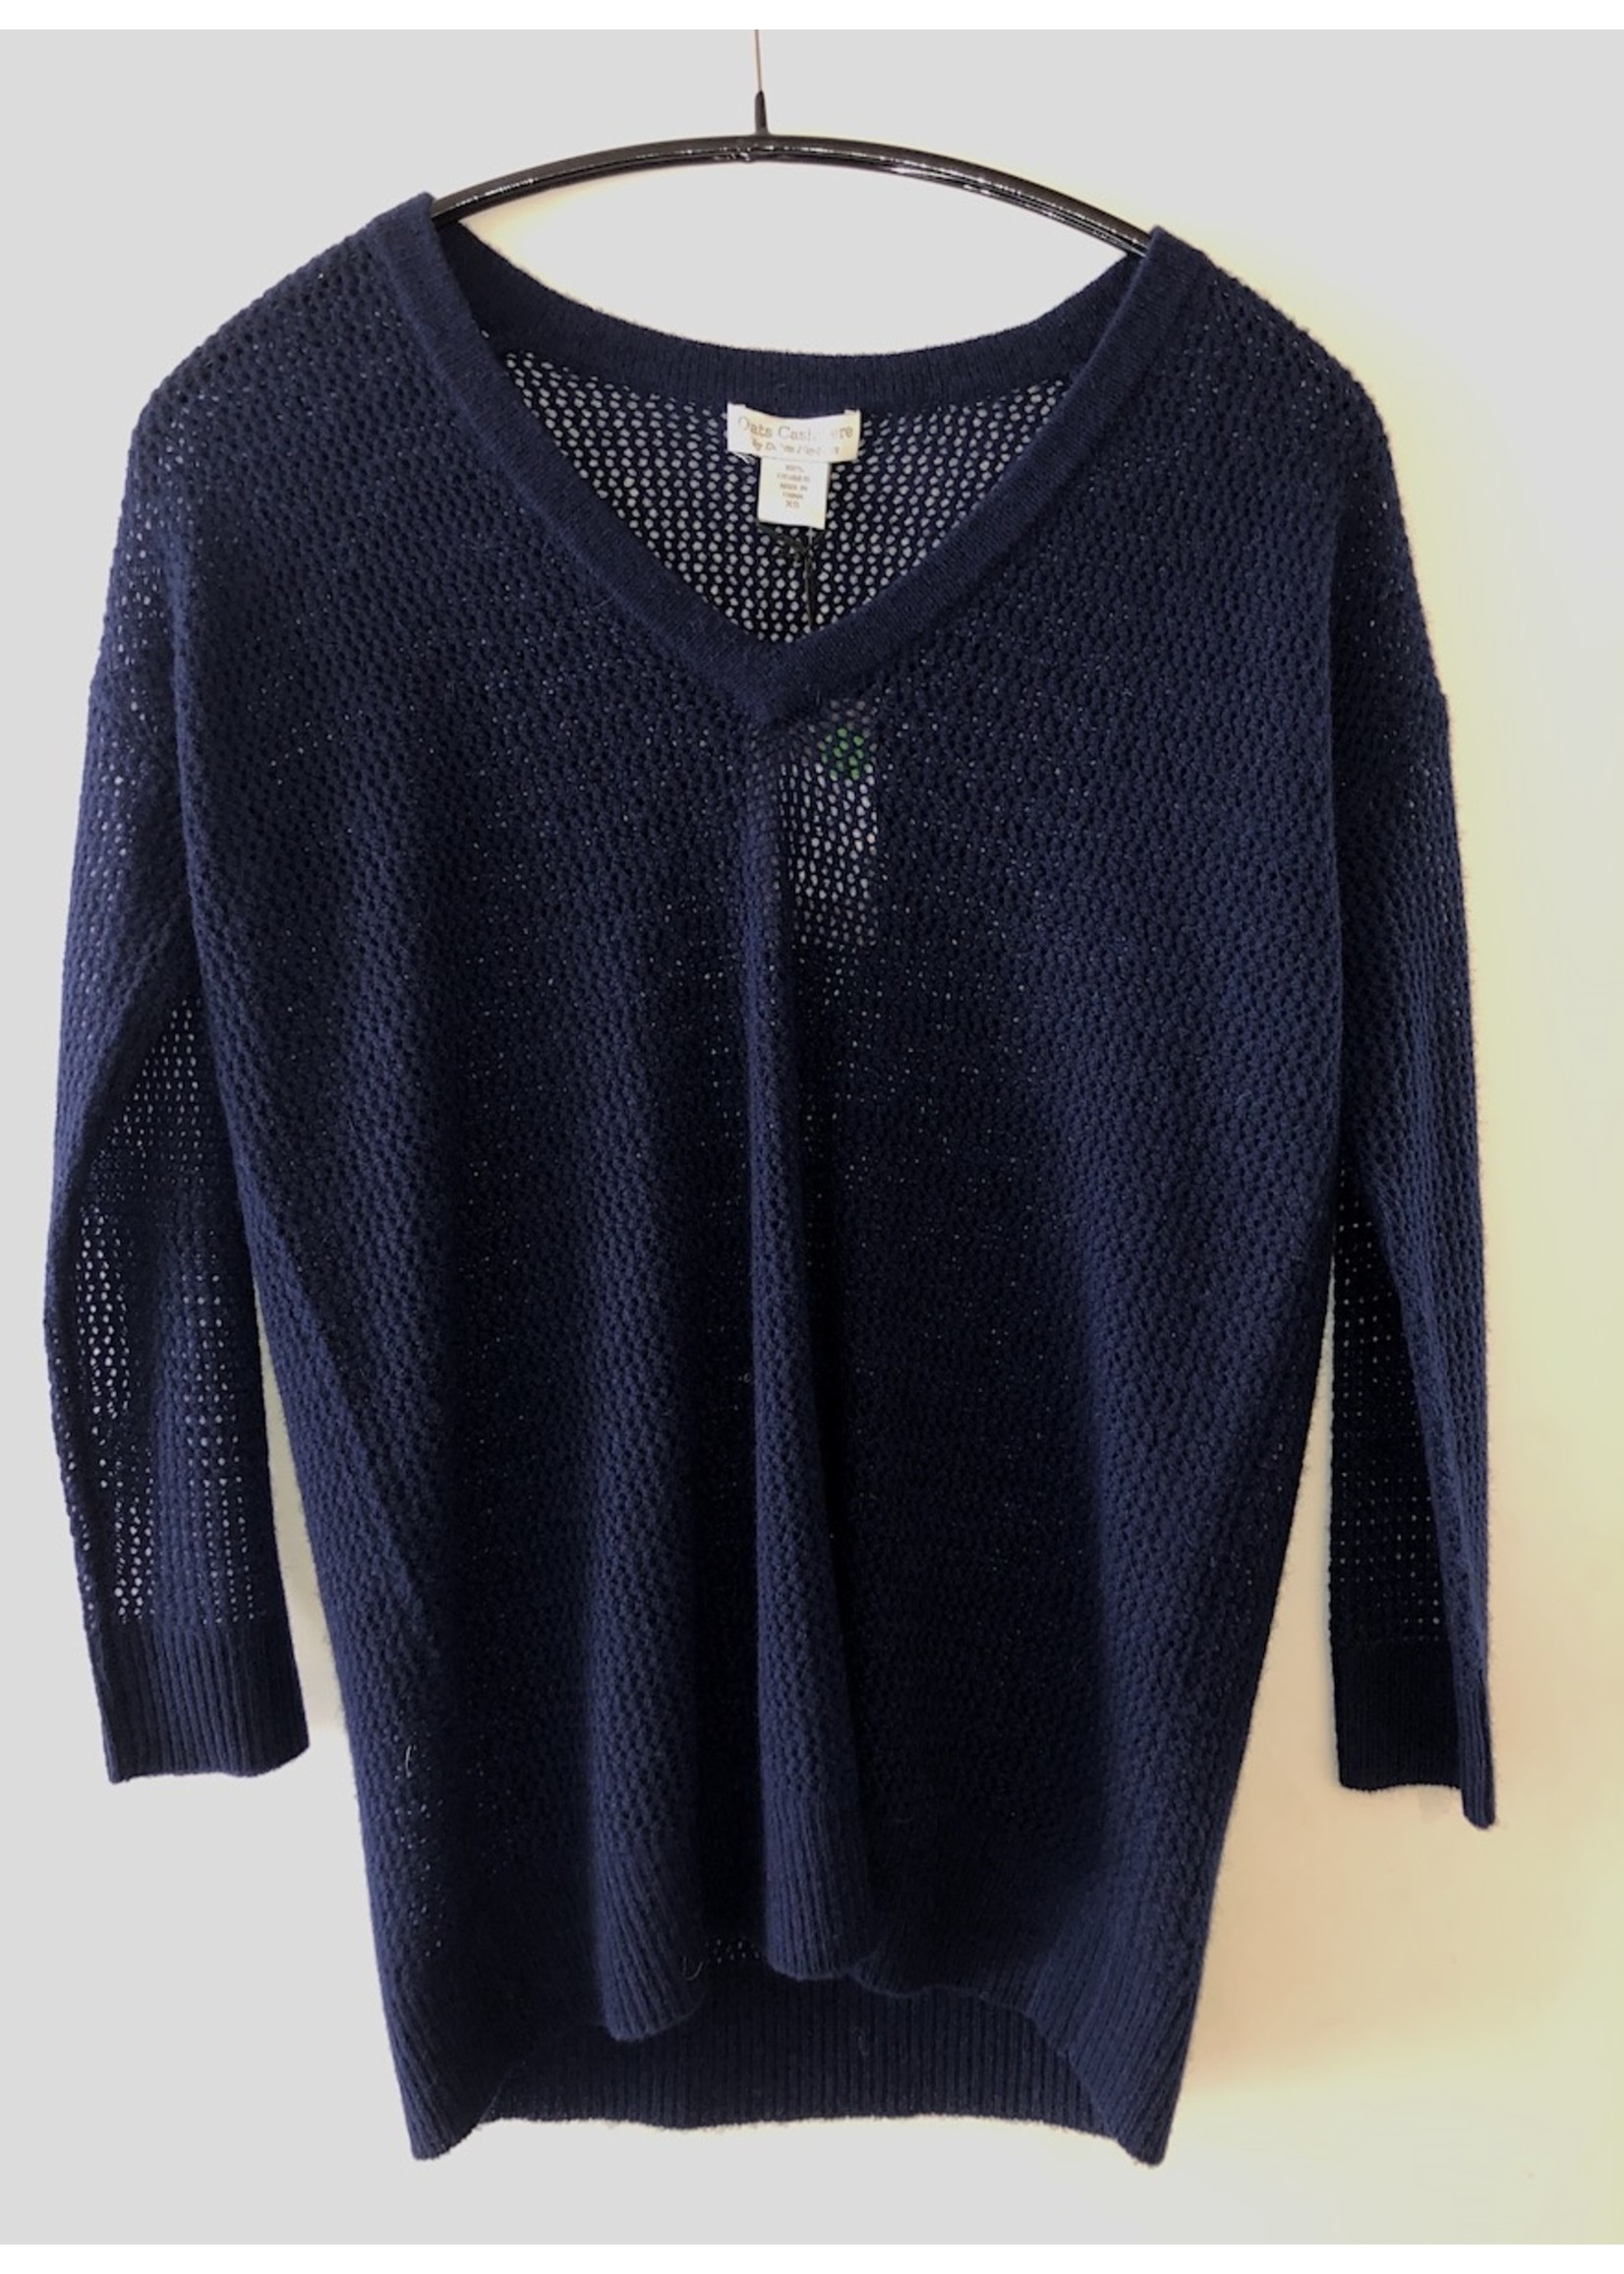 Oats Cashmere Kittie Cashmere Sweaters